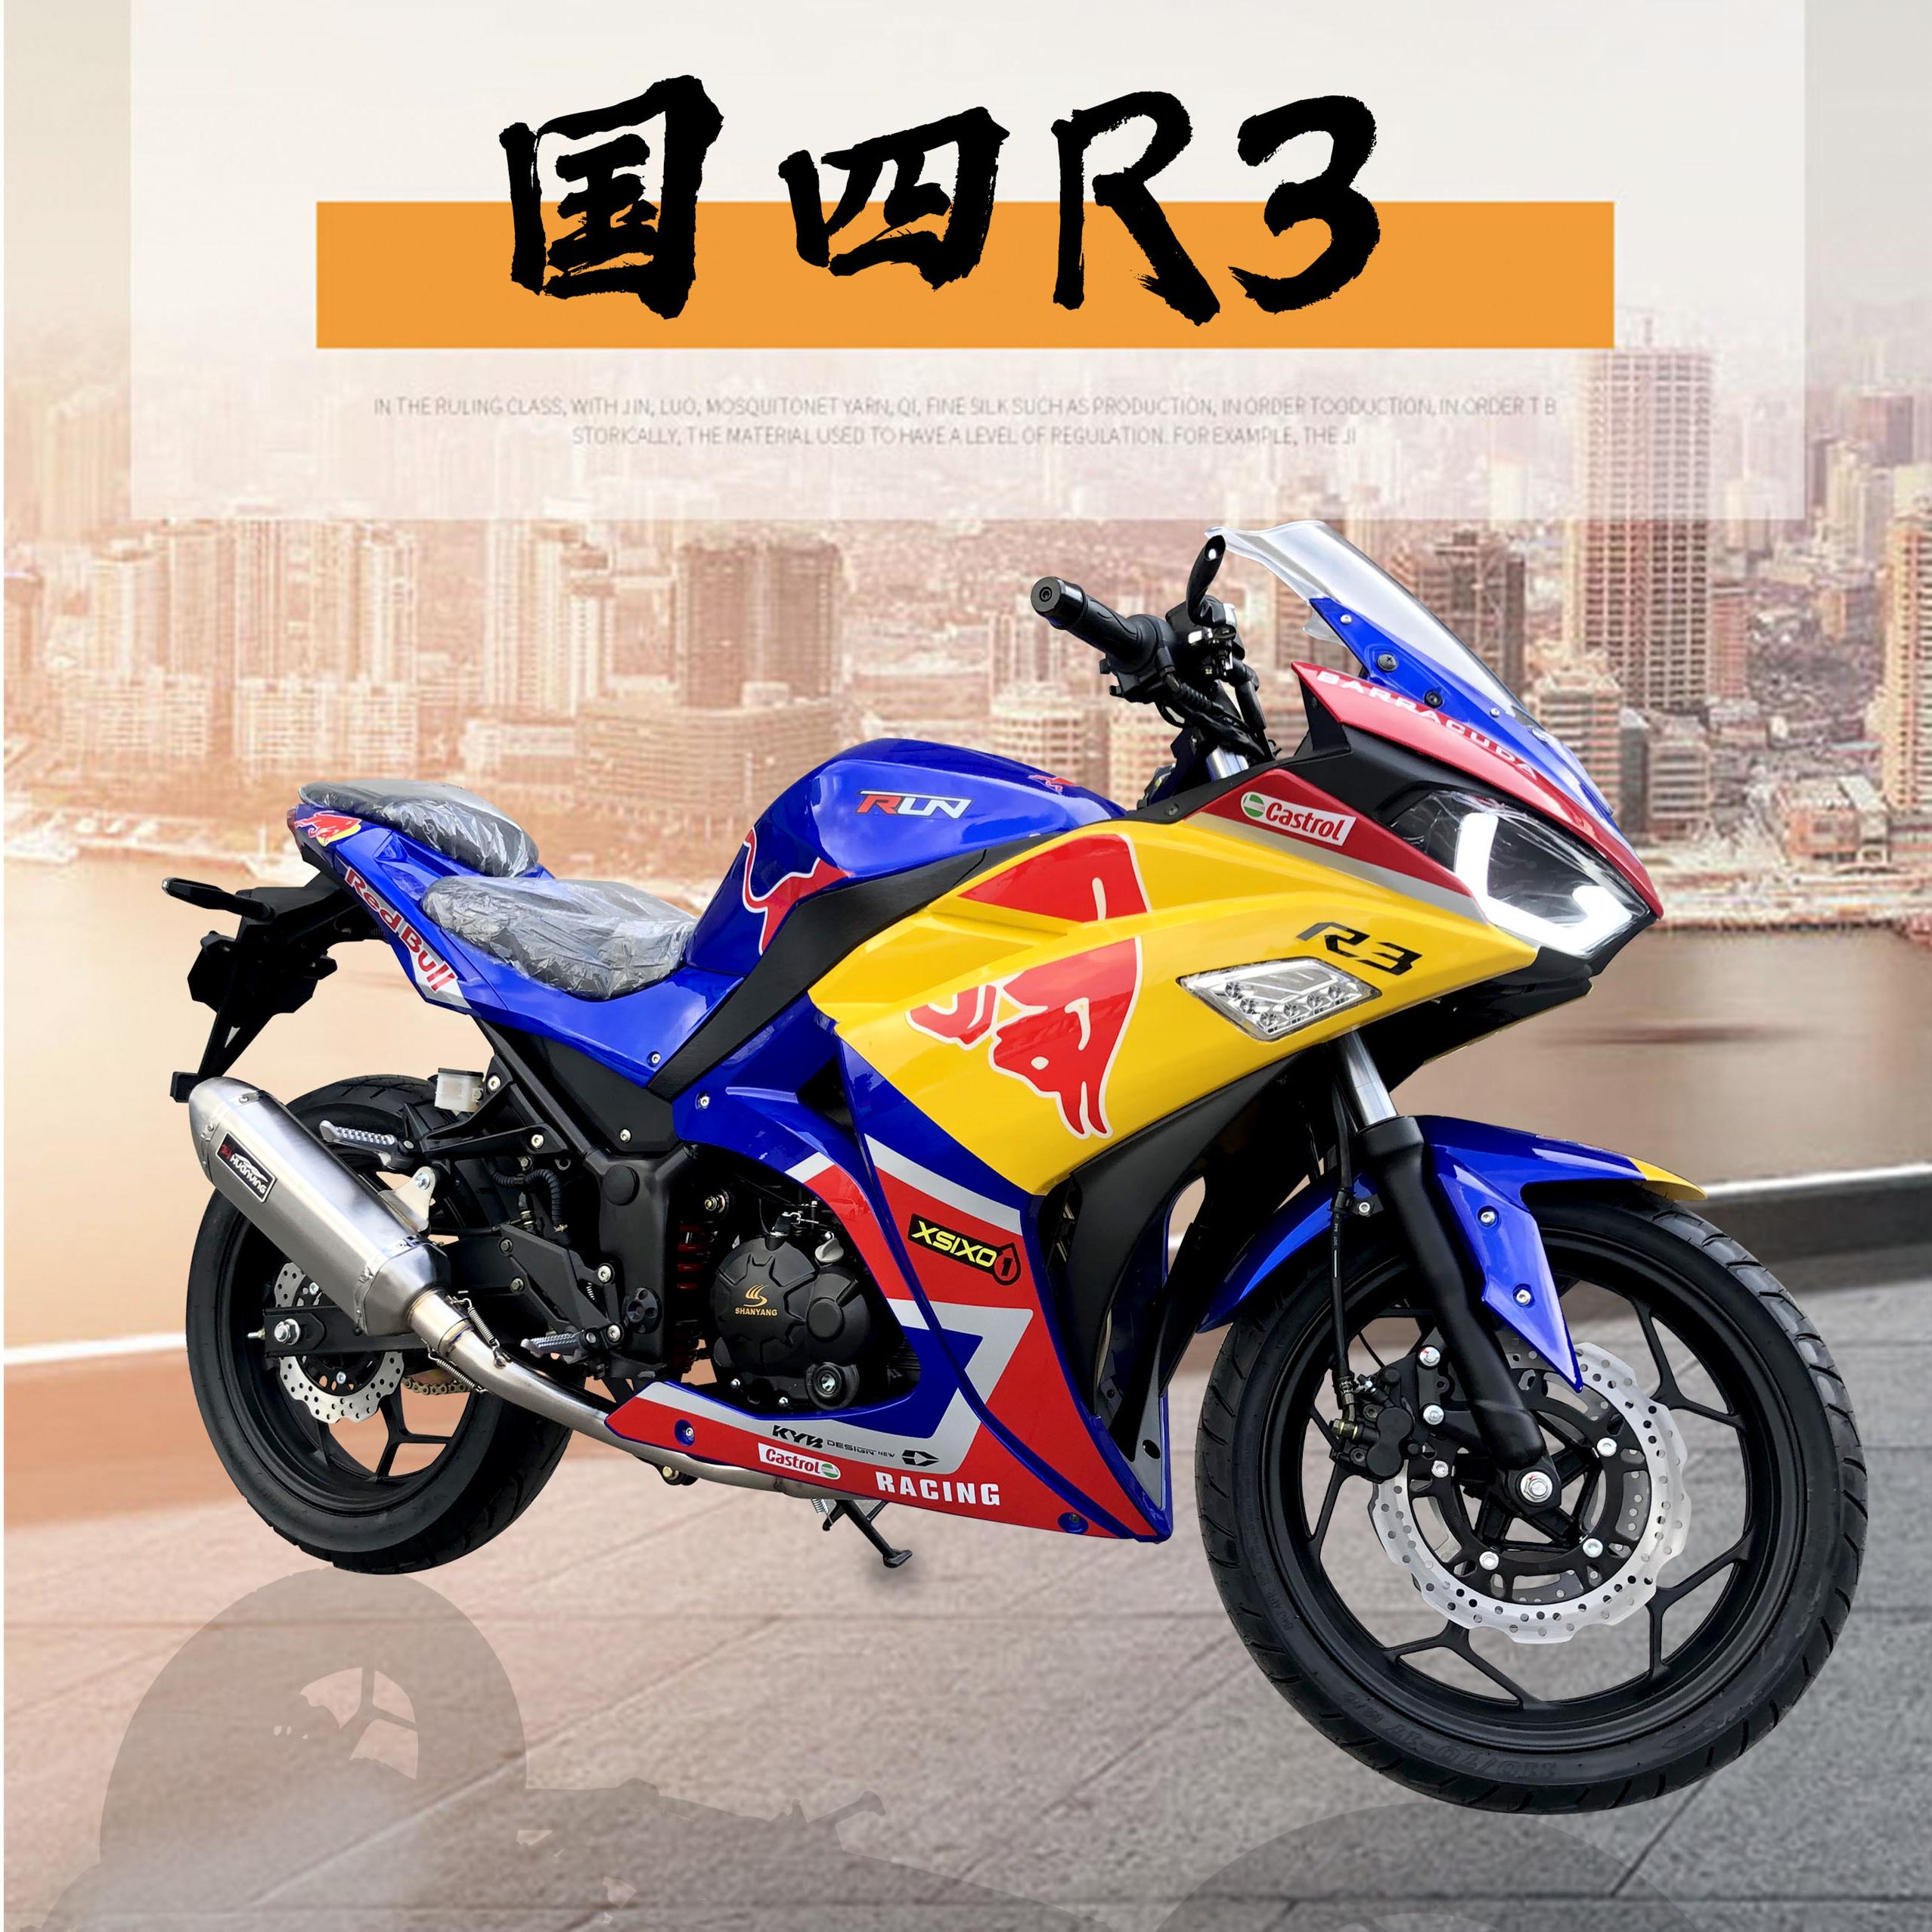 Guosi EFI R3 phantom 200cc-400cc motorcycle sports car V6 lying race R3 heavy locomotive can be licensed motorcycle